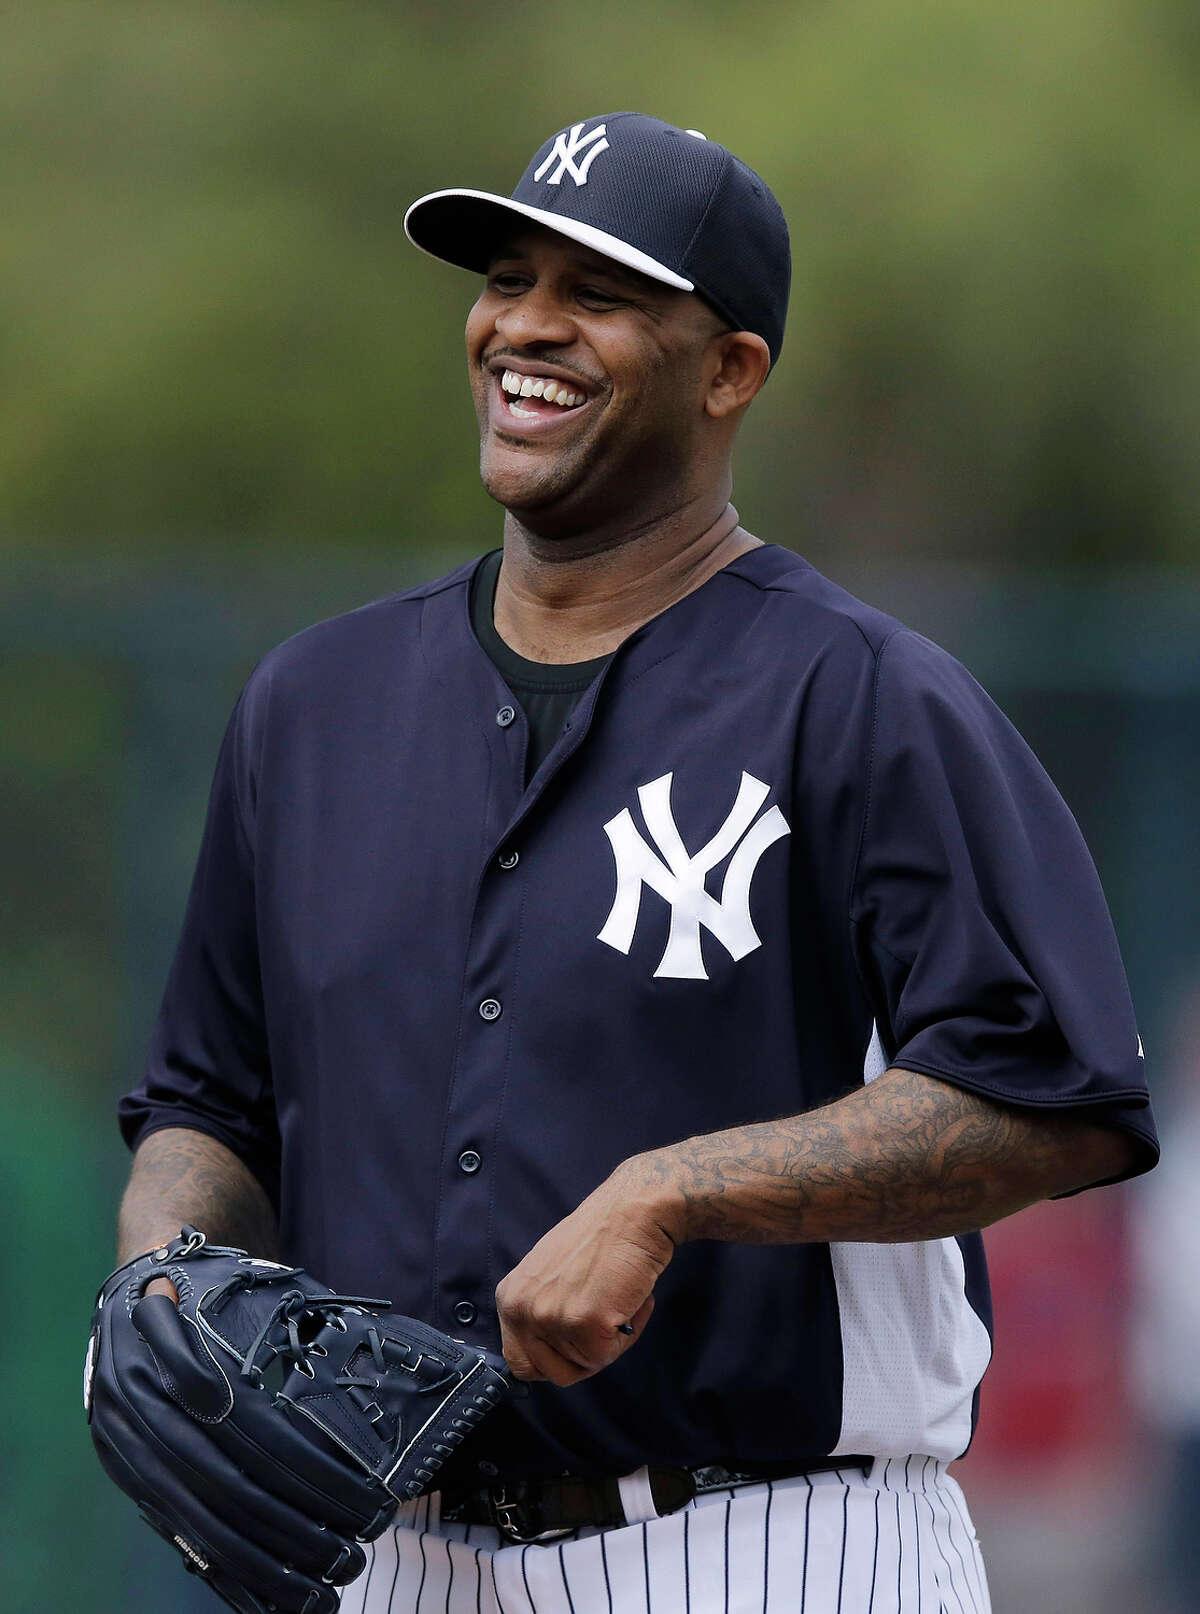 New York Yankees' CC Sabathia laughs during a workout at baseball spring training, Wednesday, Feb. 13, 2013, in Tampa, Fla. (AP Photo/Matt Slocum)